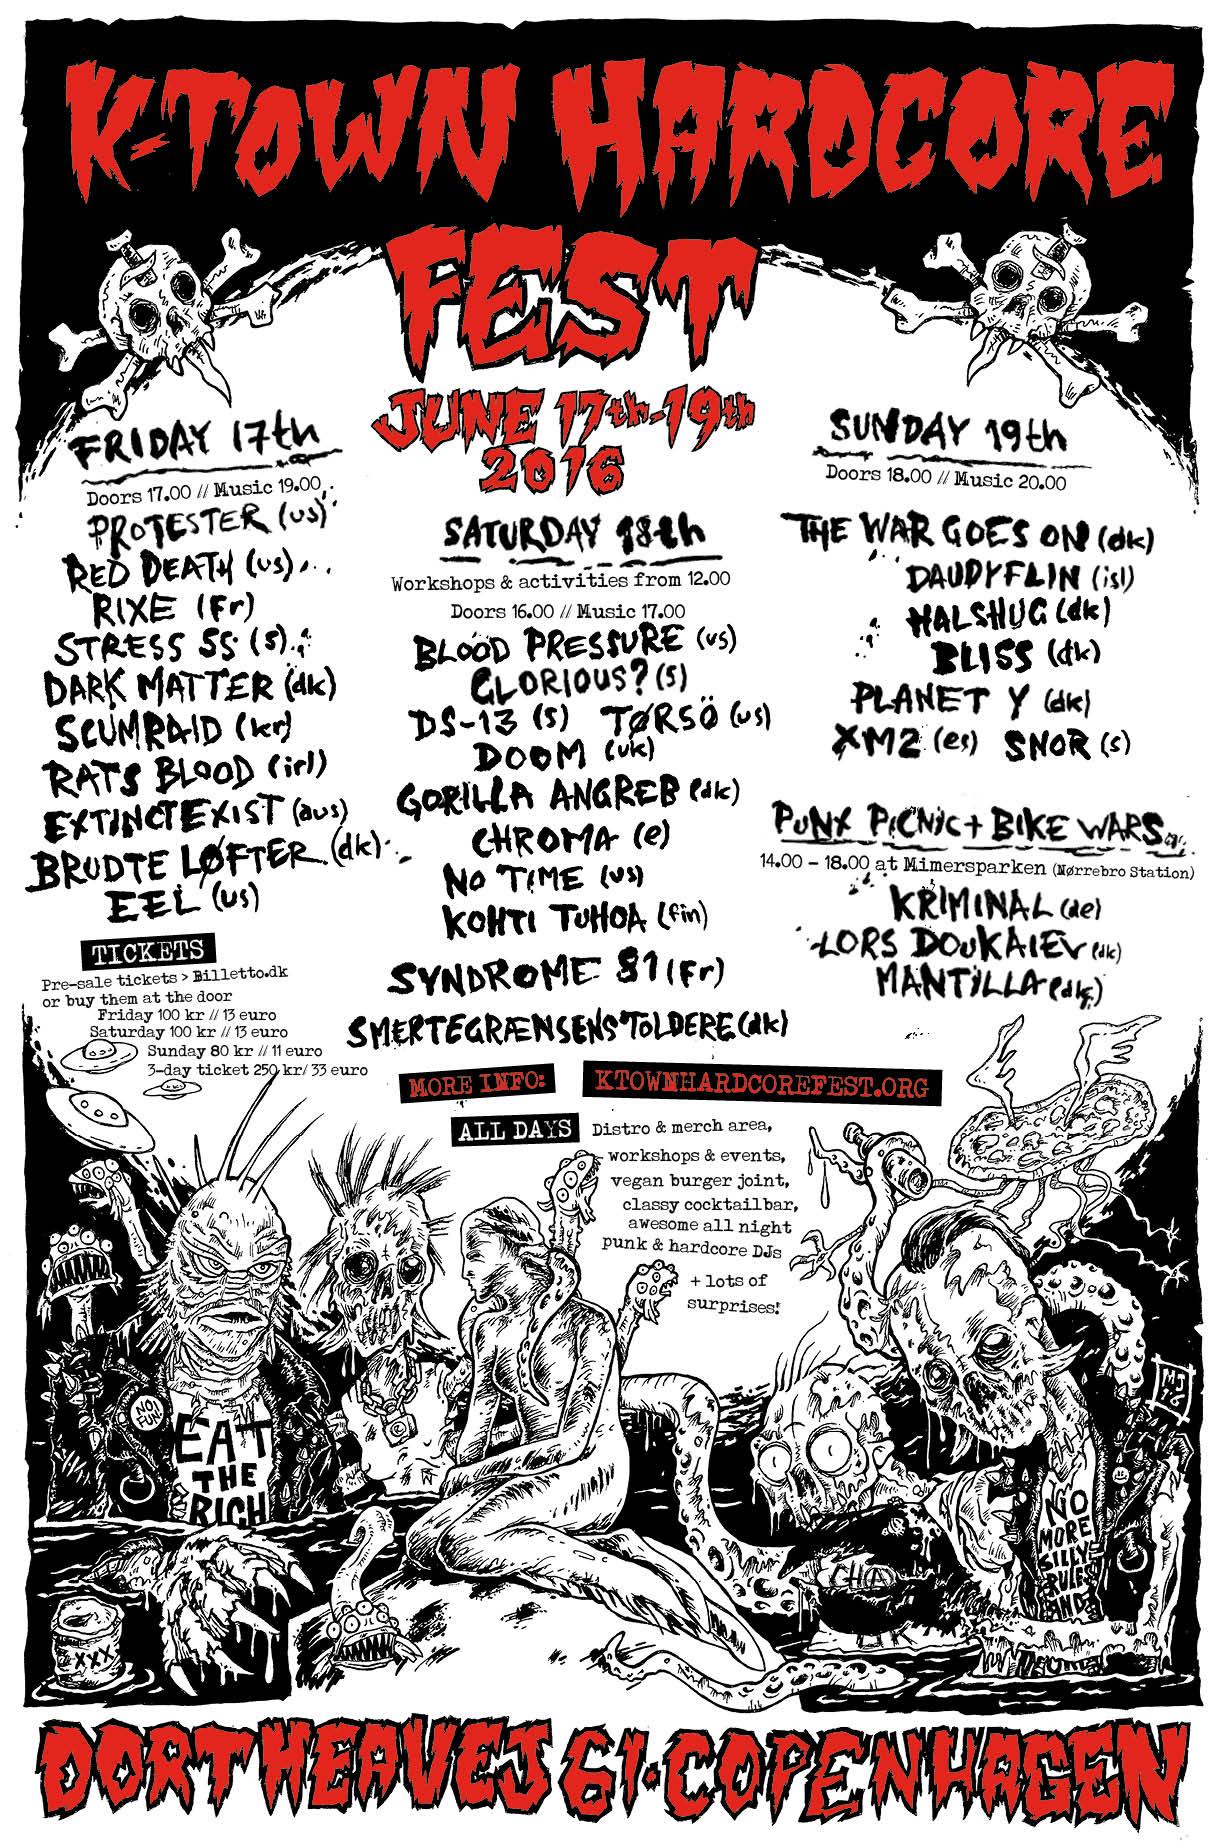 K-TOWN HARDCORE FEST 2016